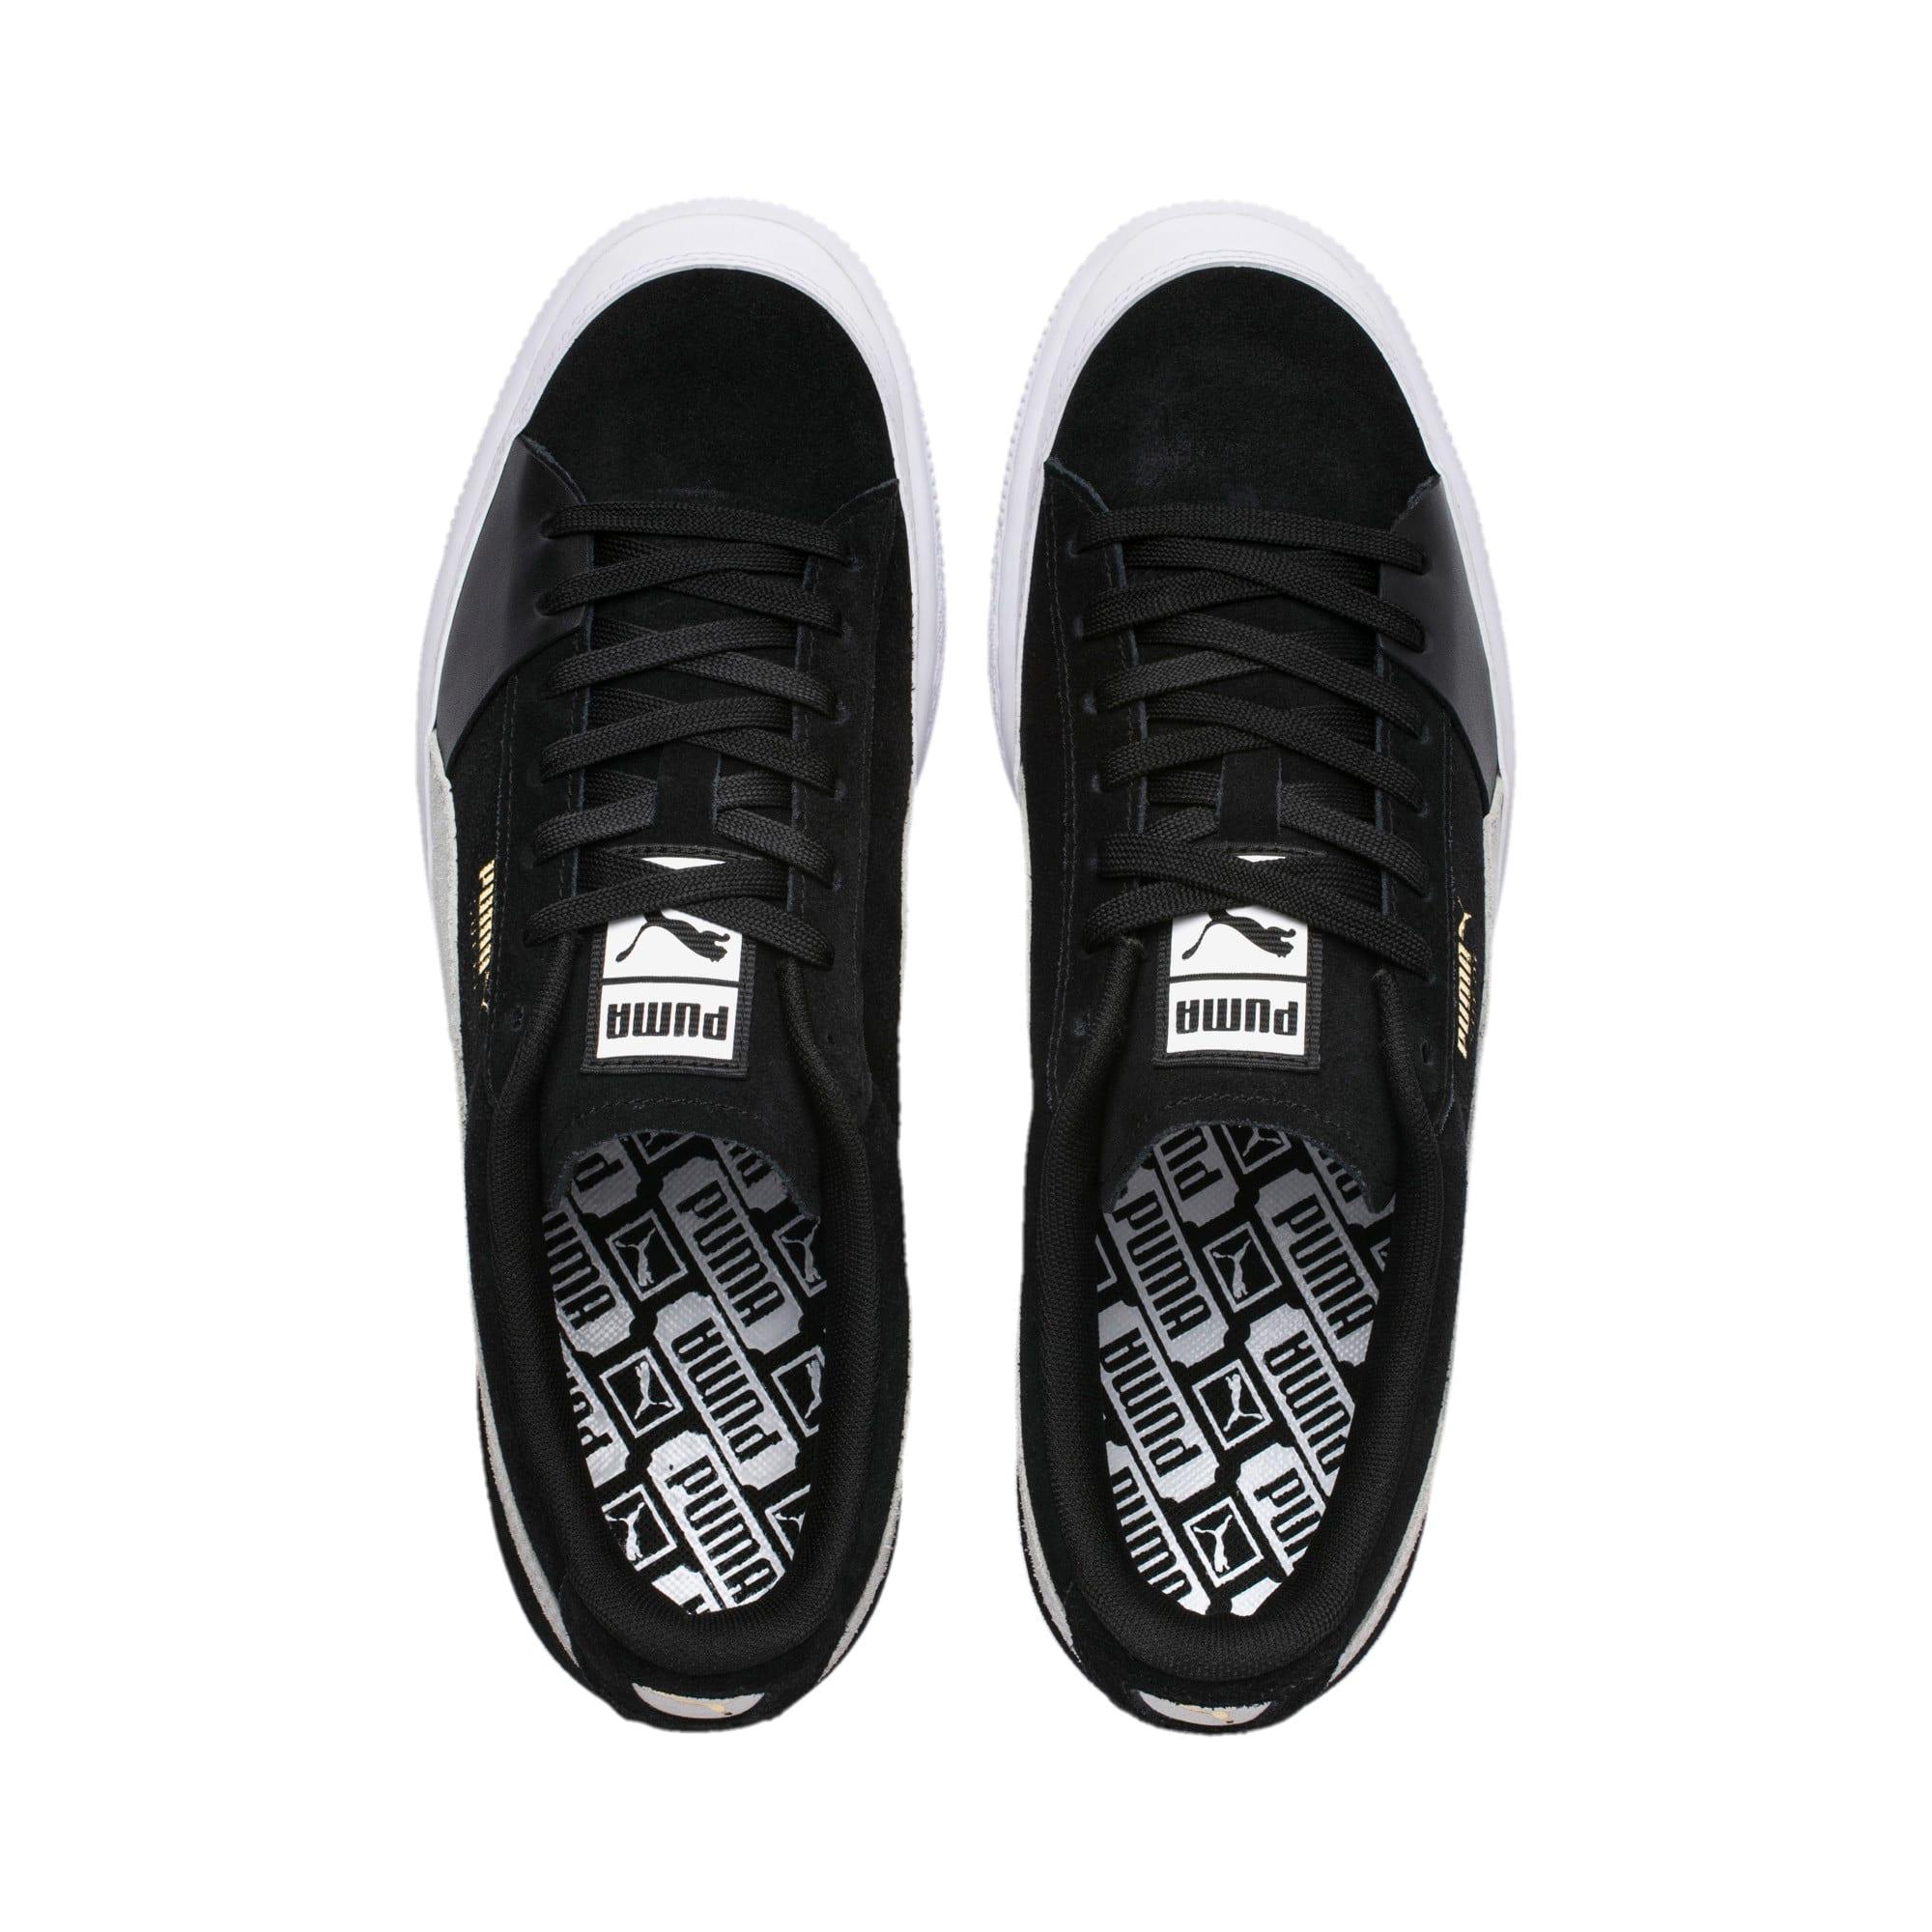 Thumbnail 6 of Suede Skate Sneakers, Puma Black-Puma White, medium